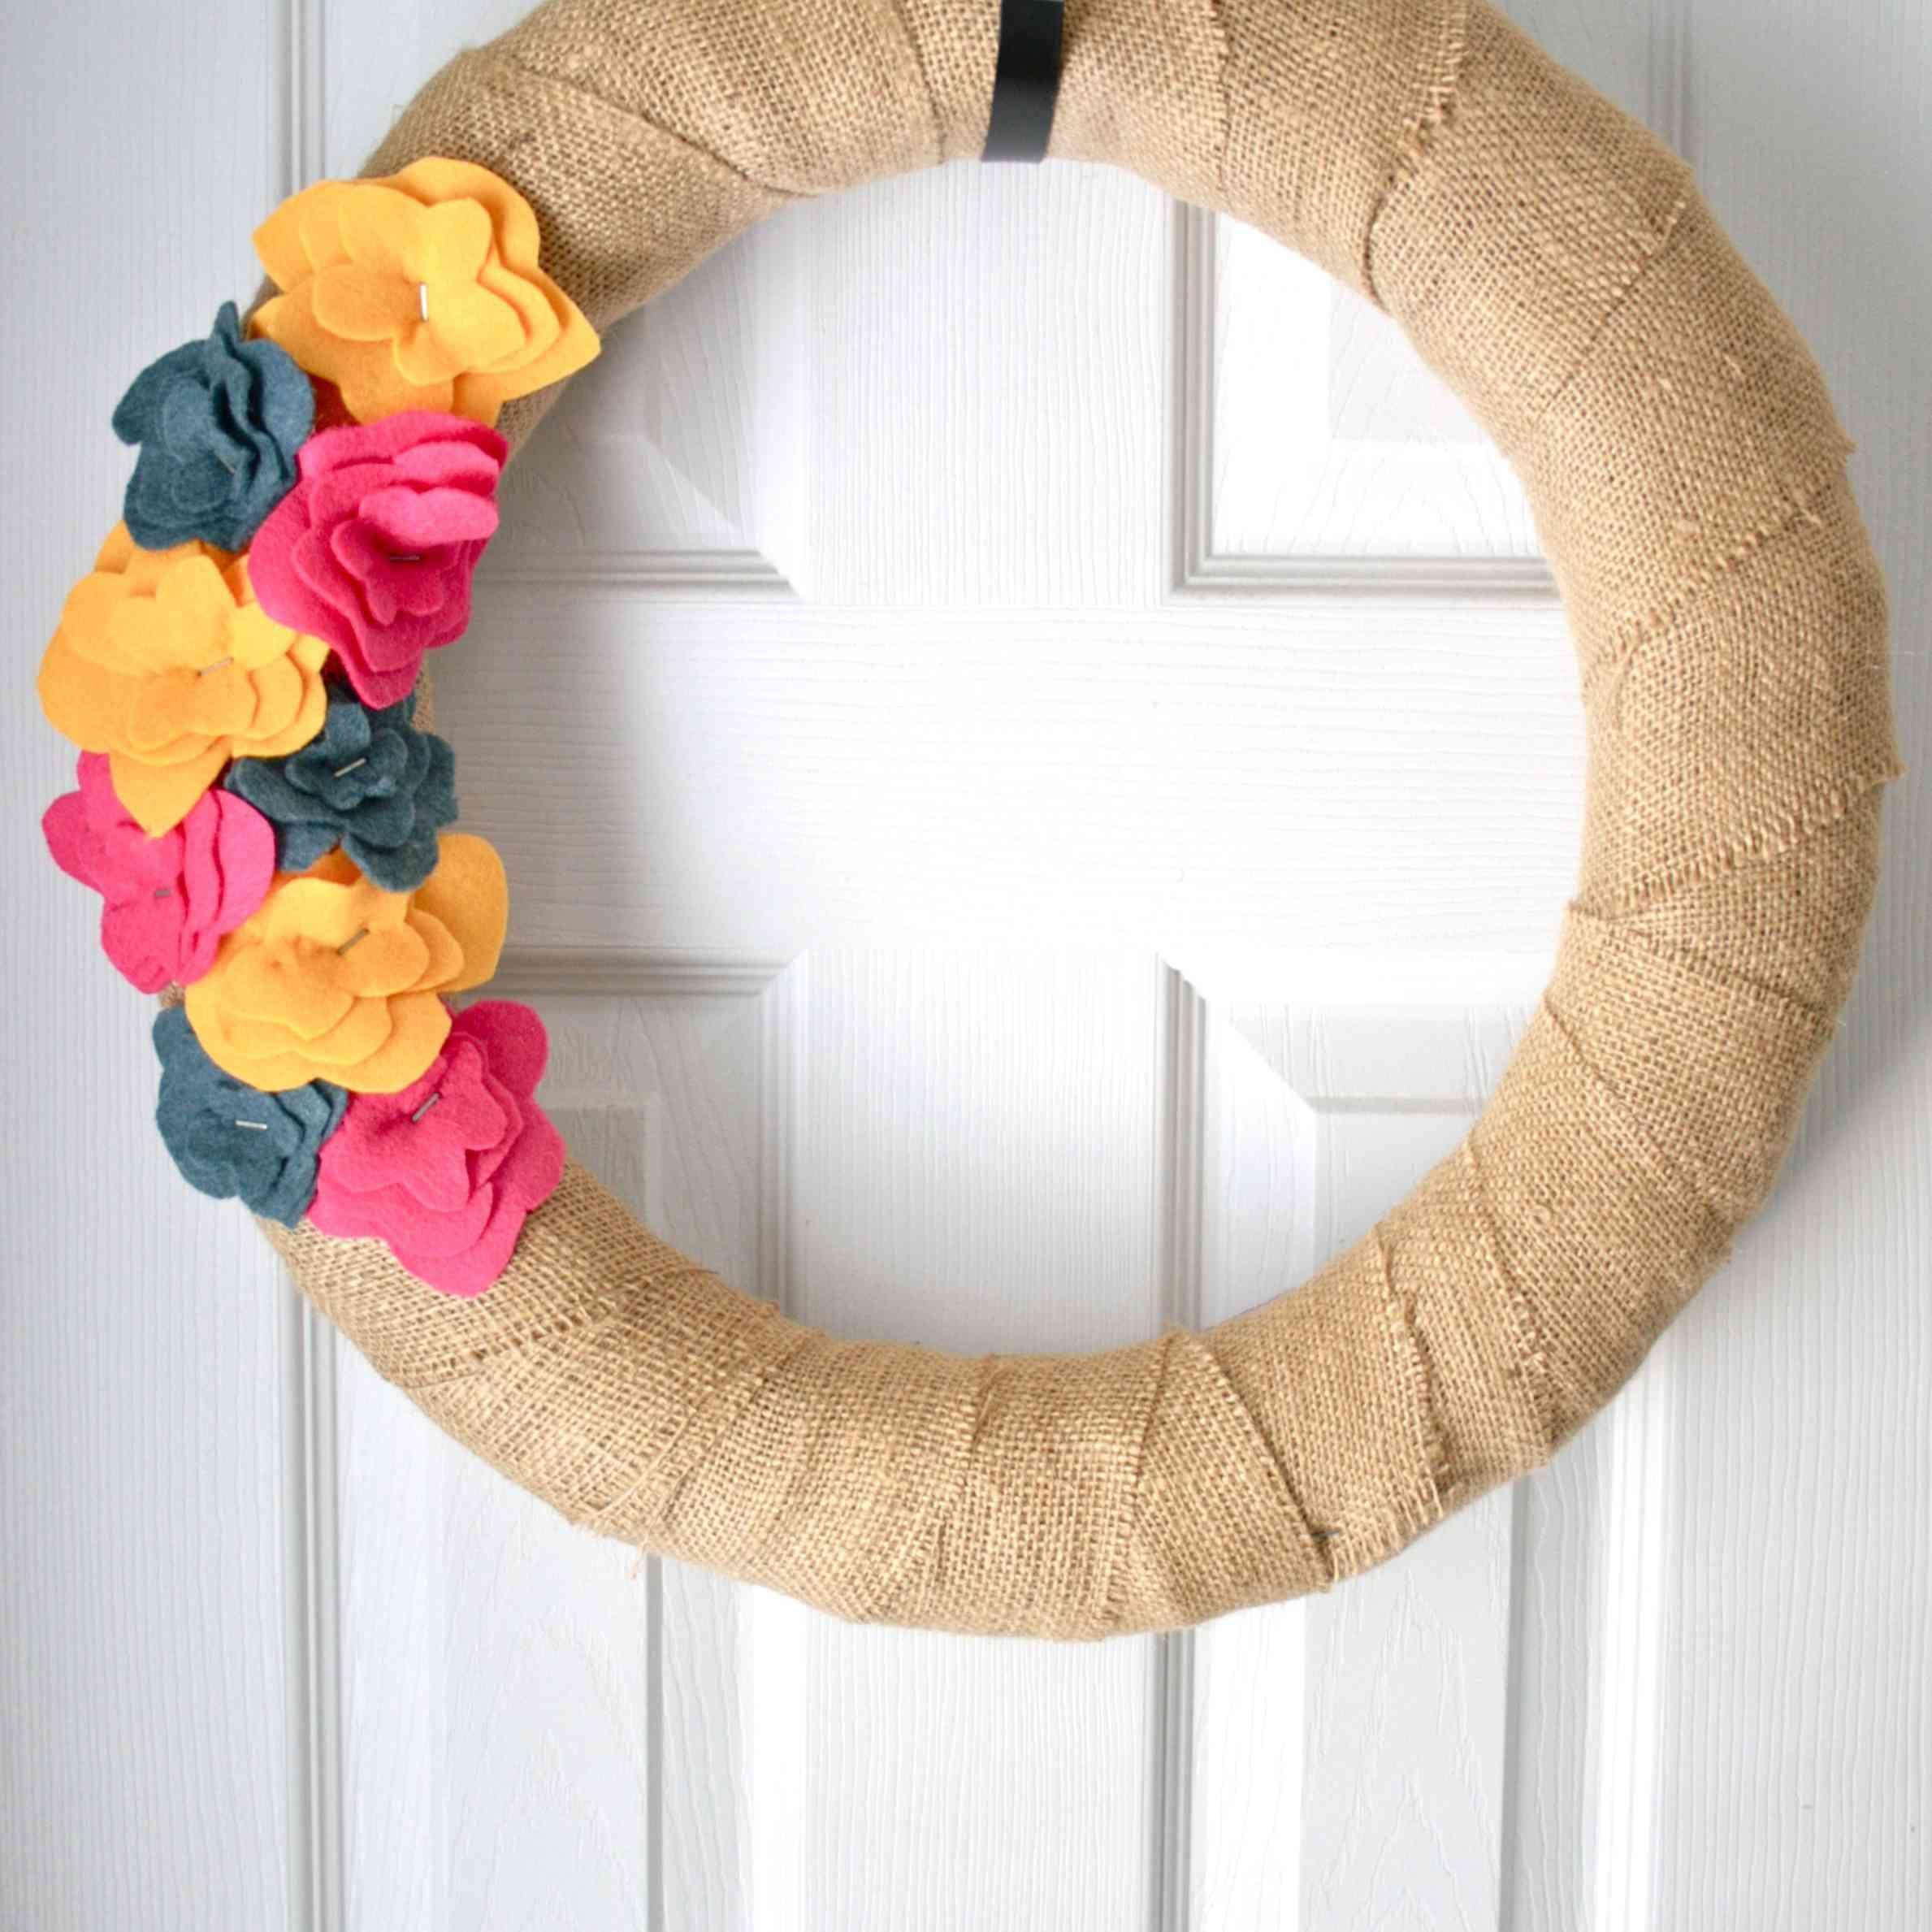 DIY Burlap Wrapped Flower Wreath